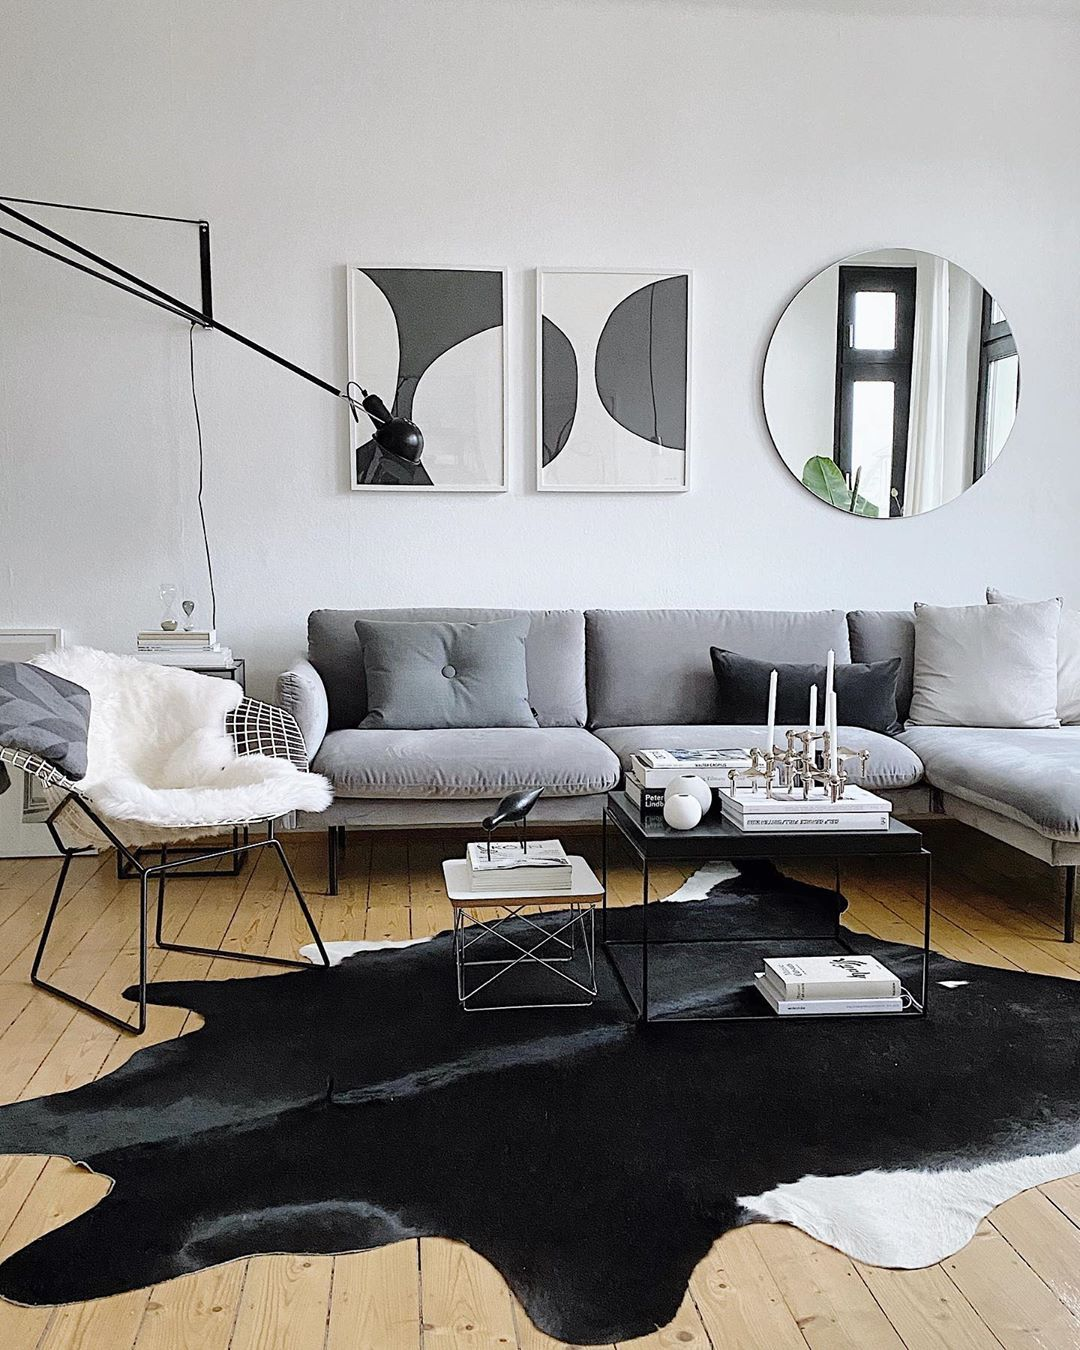 "Alexander Paar's Instagram profile post: ""Not leaving the sofa today 🕯🕯🕯 #happysunday #solebich #schönerwohnen #skandinavischwohnen #mynordicroom #homeinspo #scandinavianinterior…"""